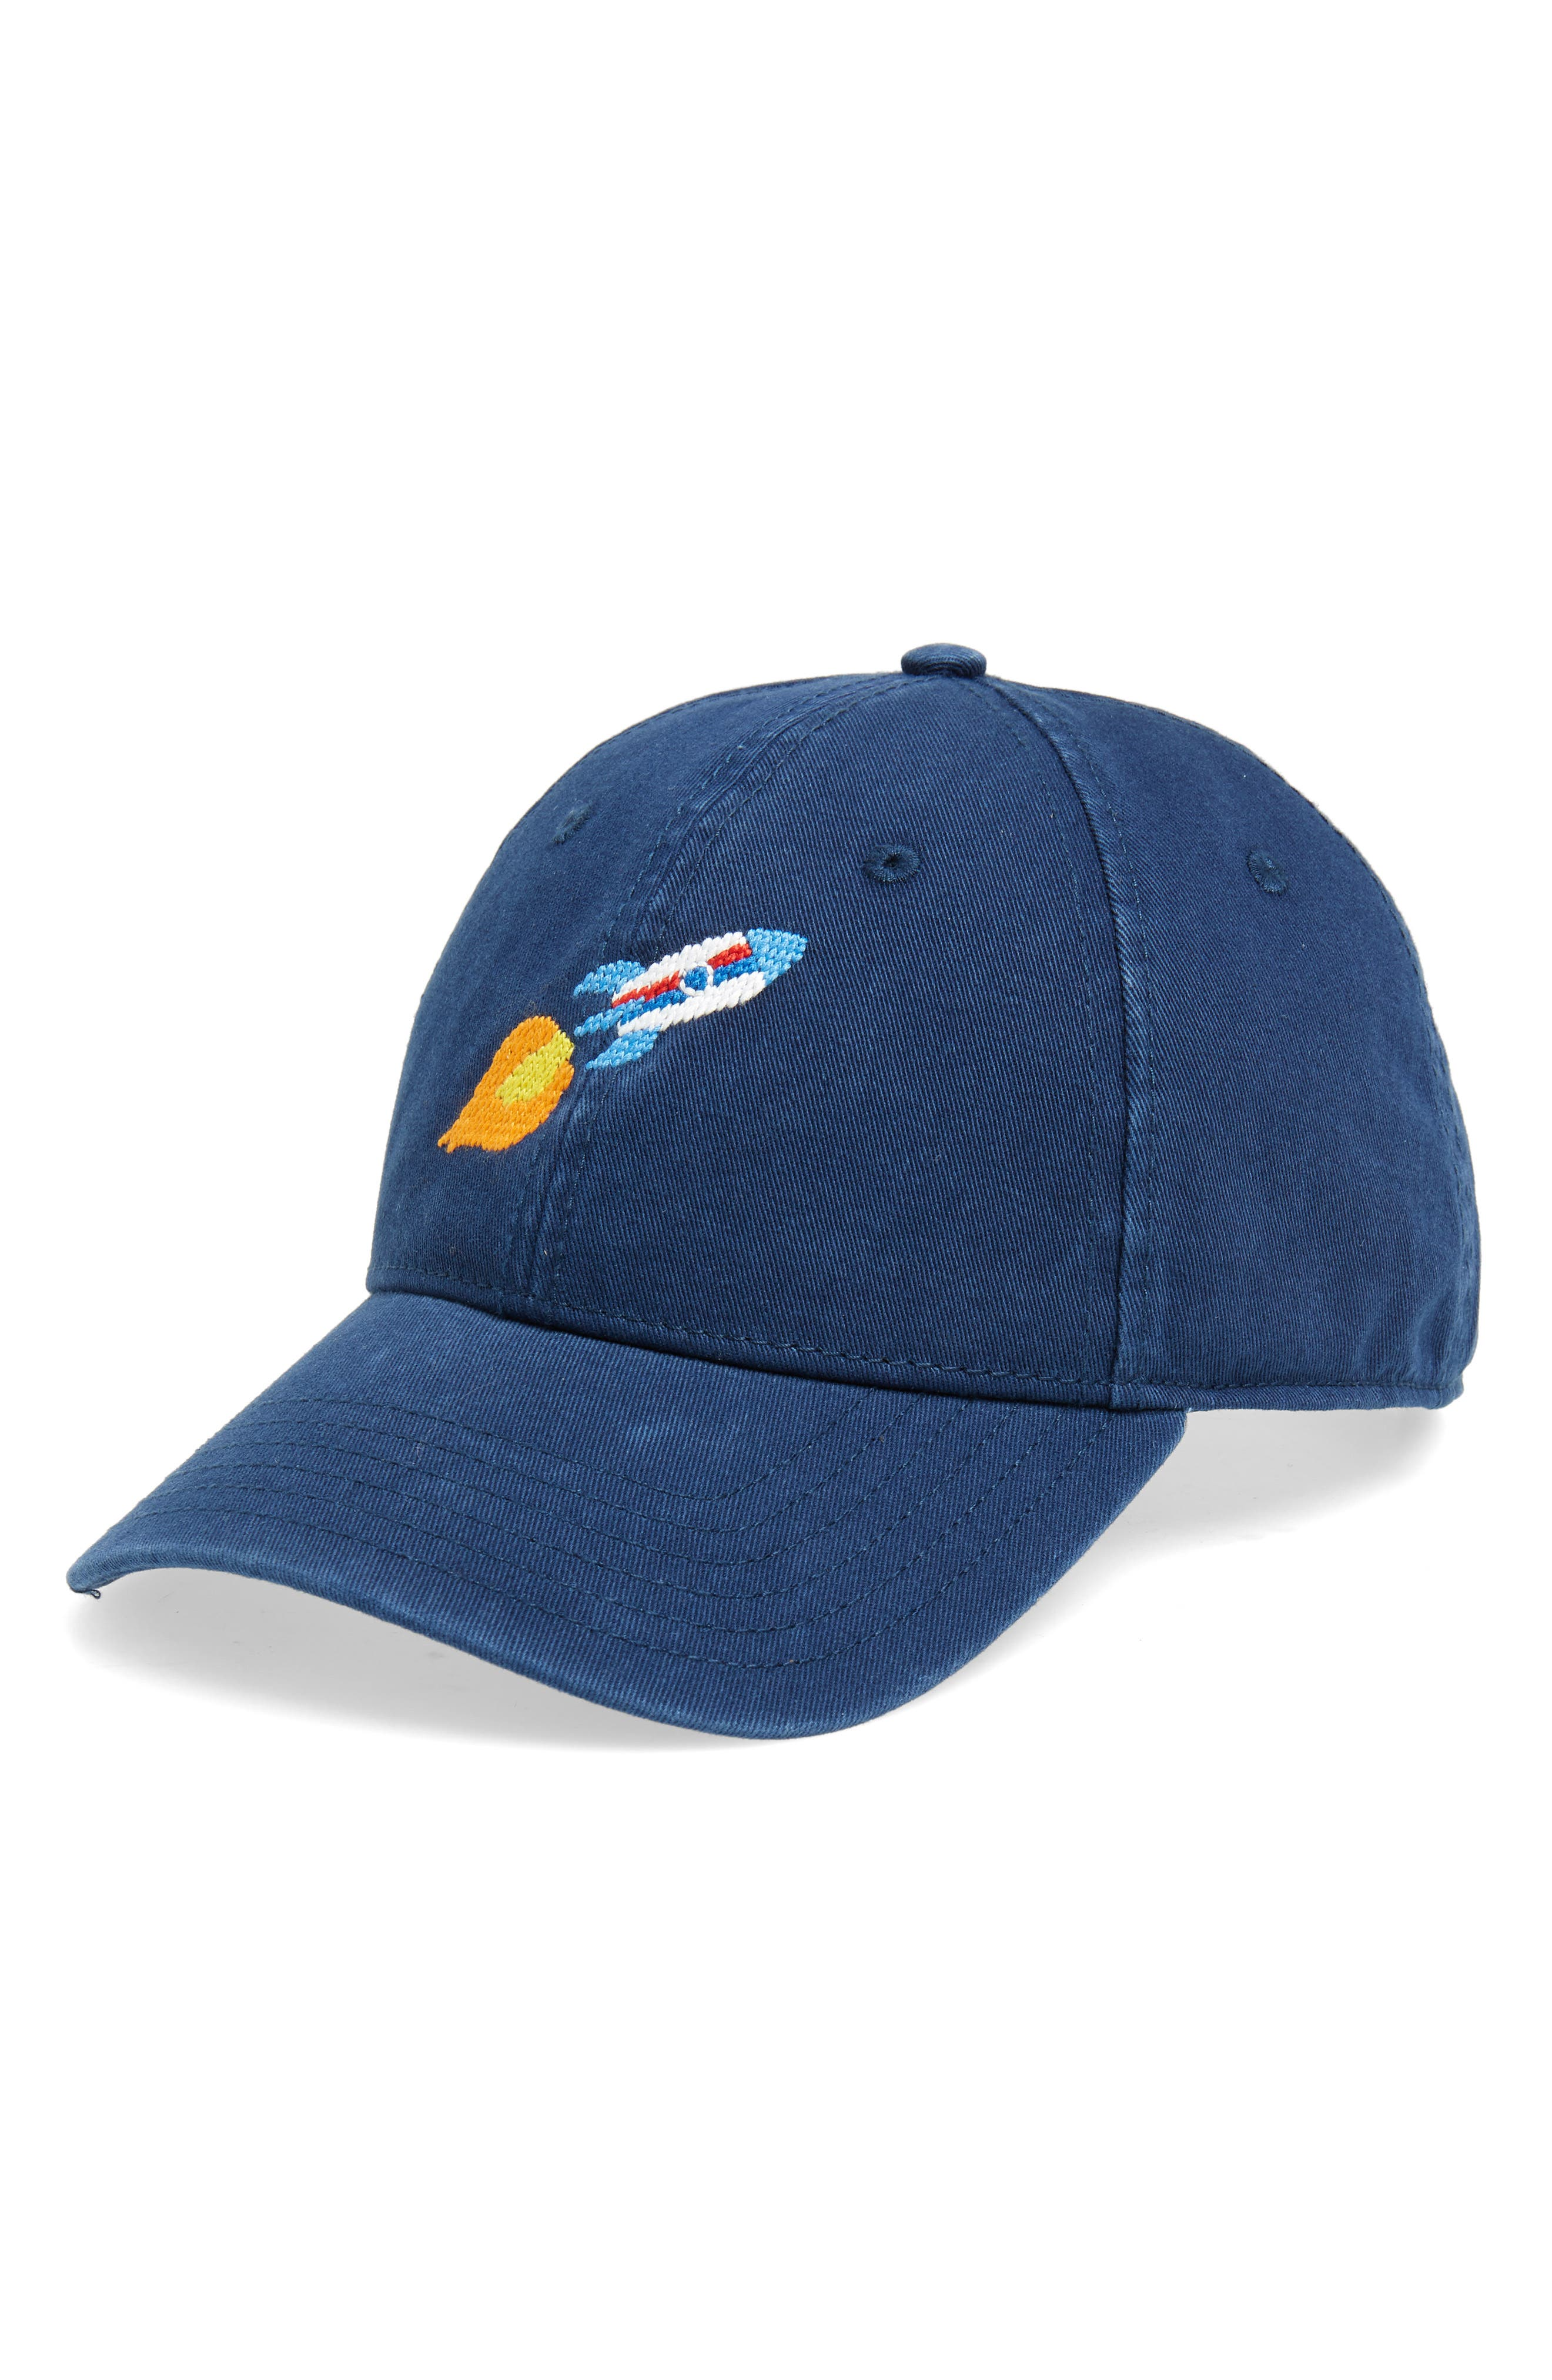 Rocket Baseball Cap,                         Main,                         color, NAVY